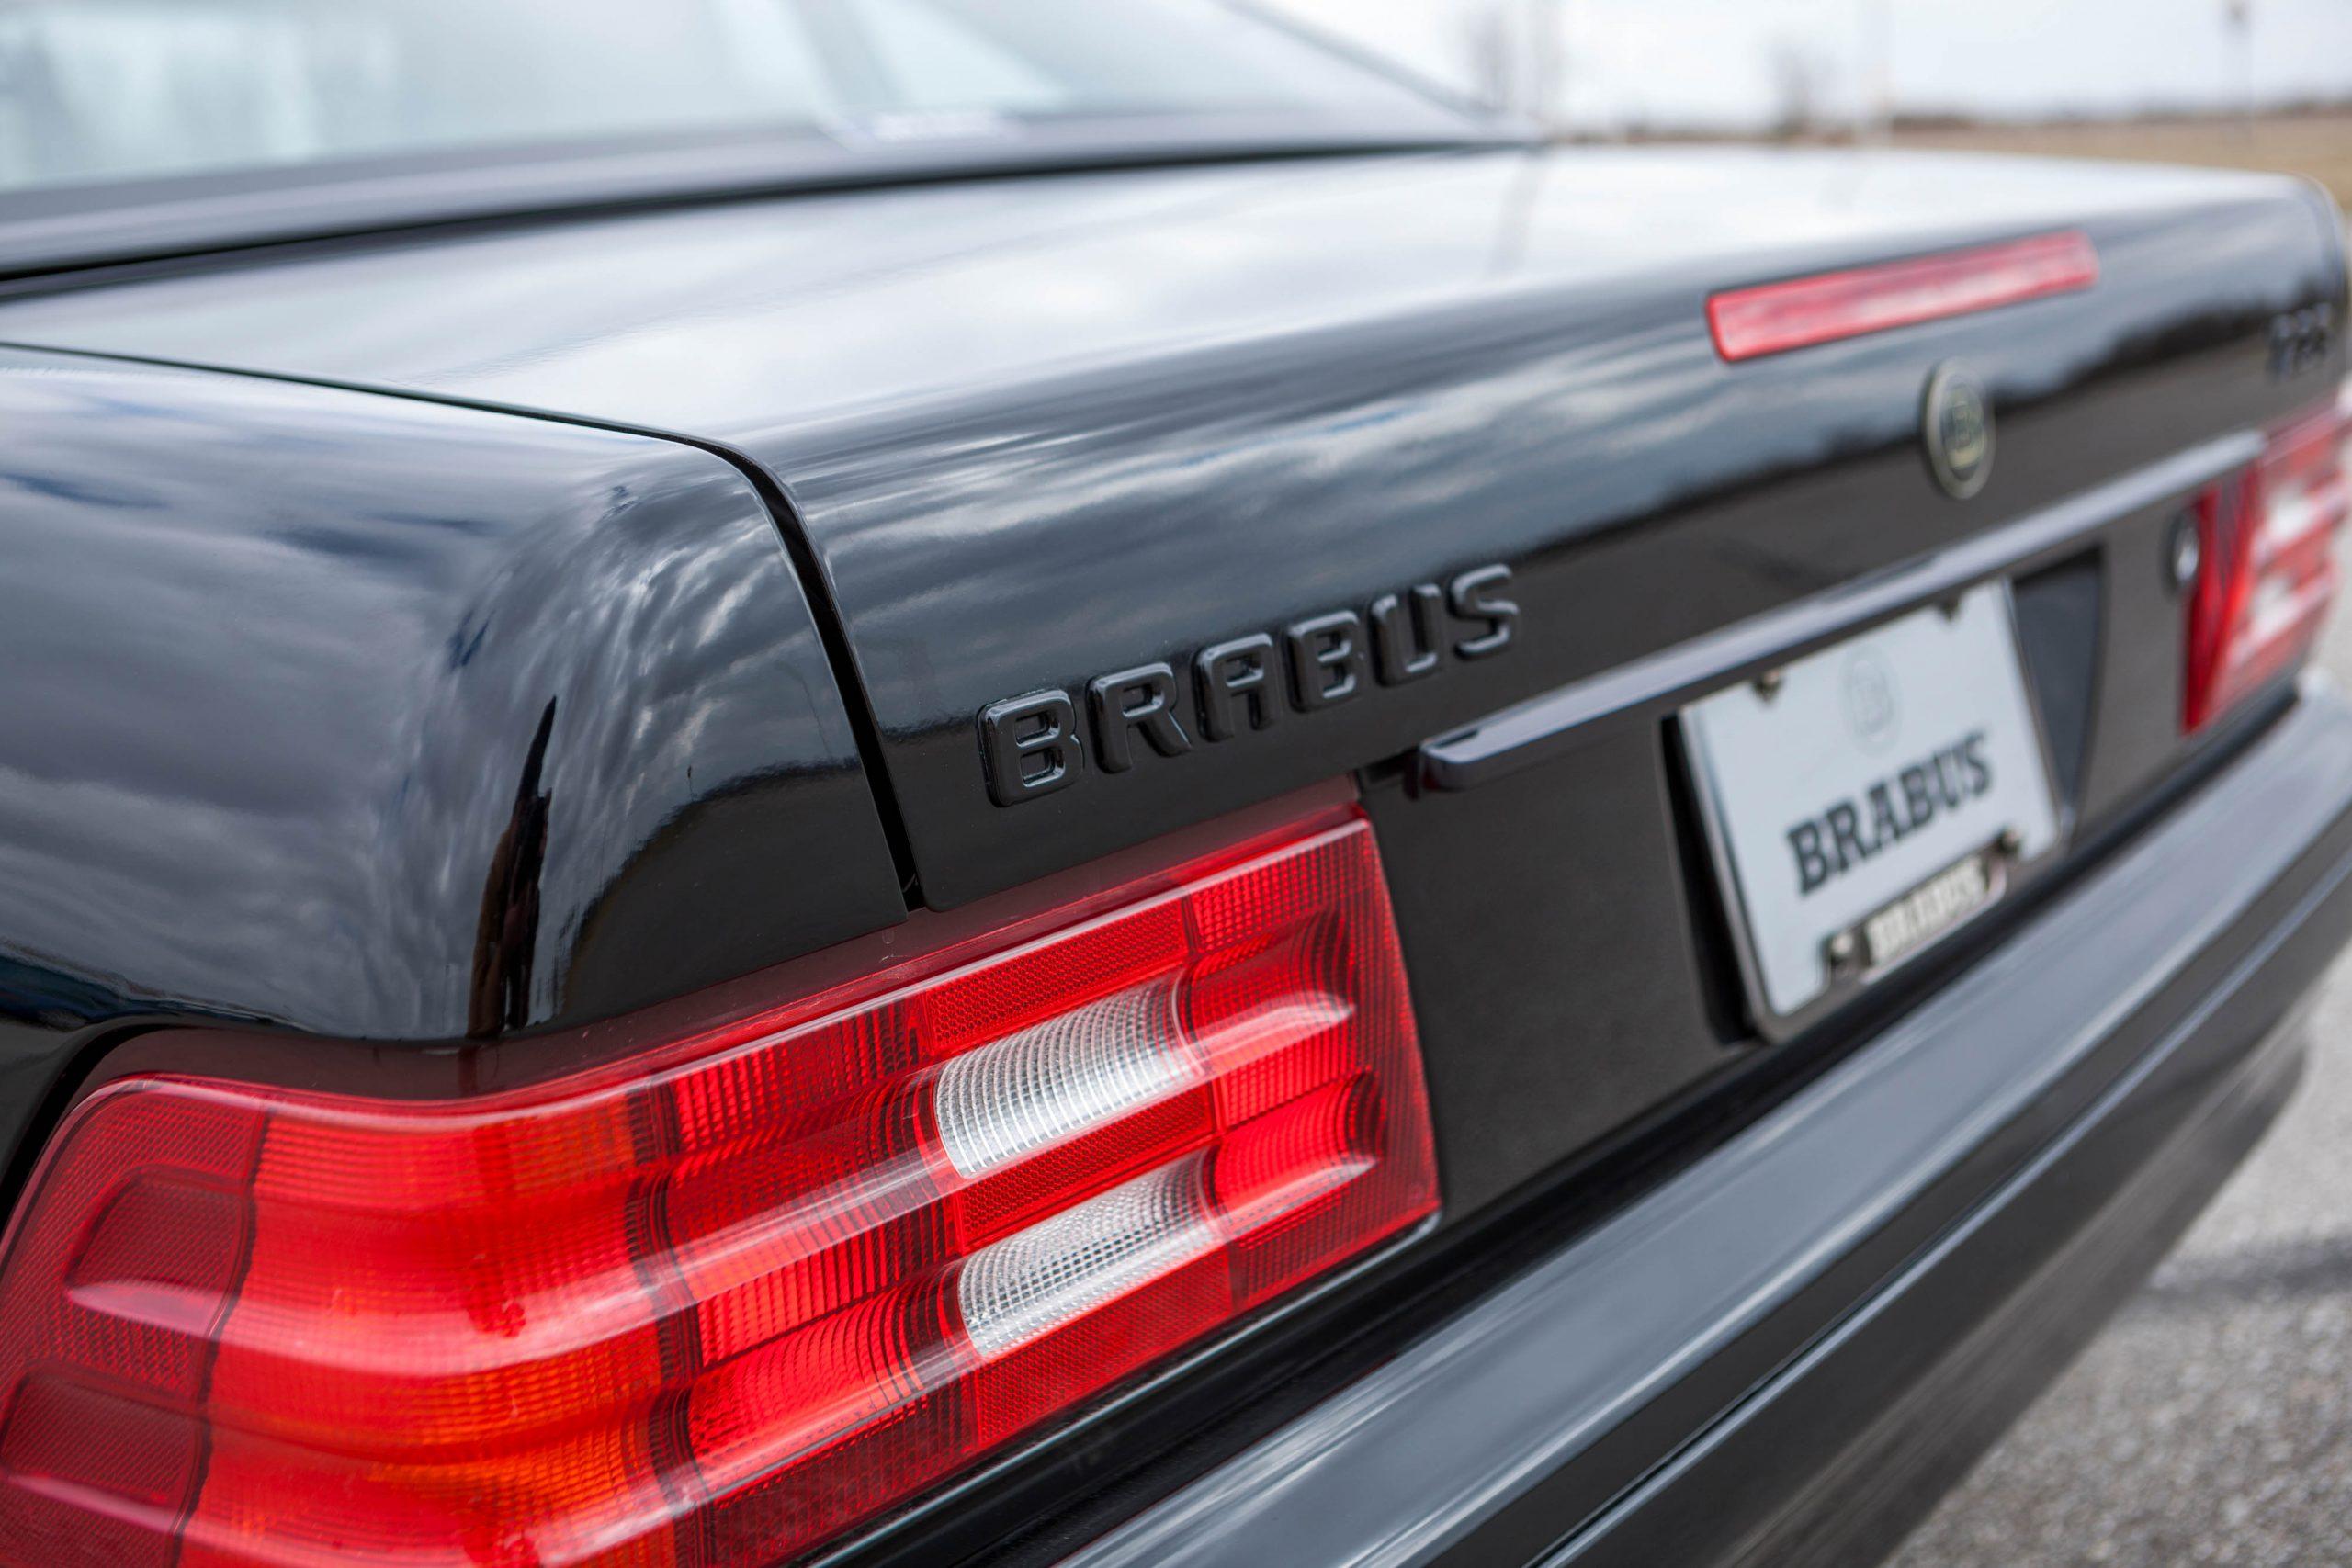 1999 Mercedes-Benz Brabus 7.3 S